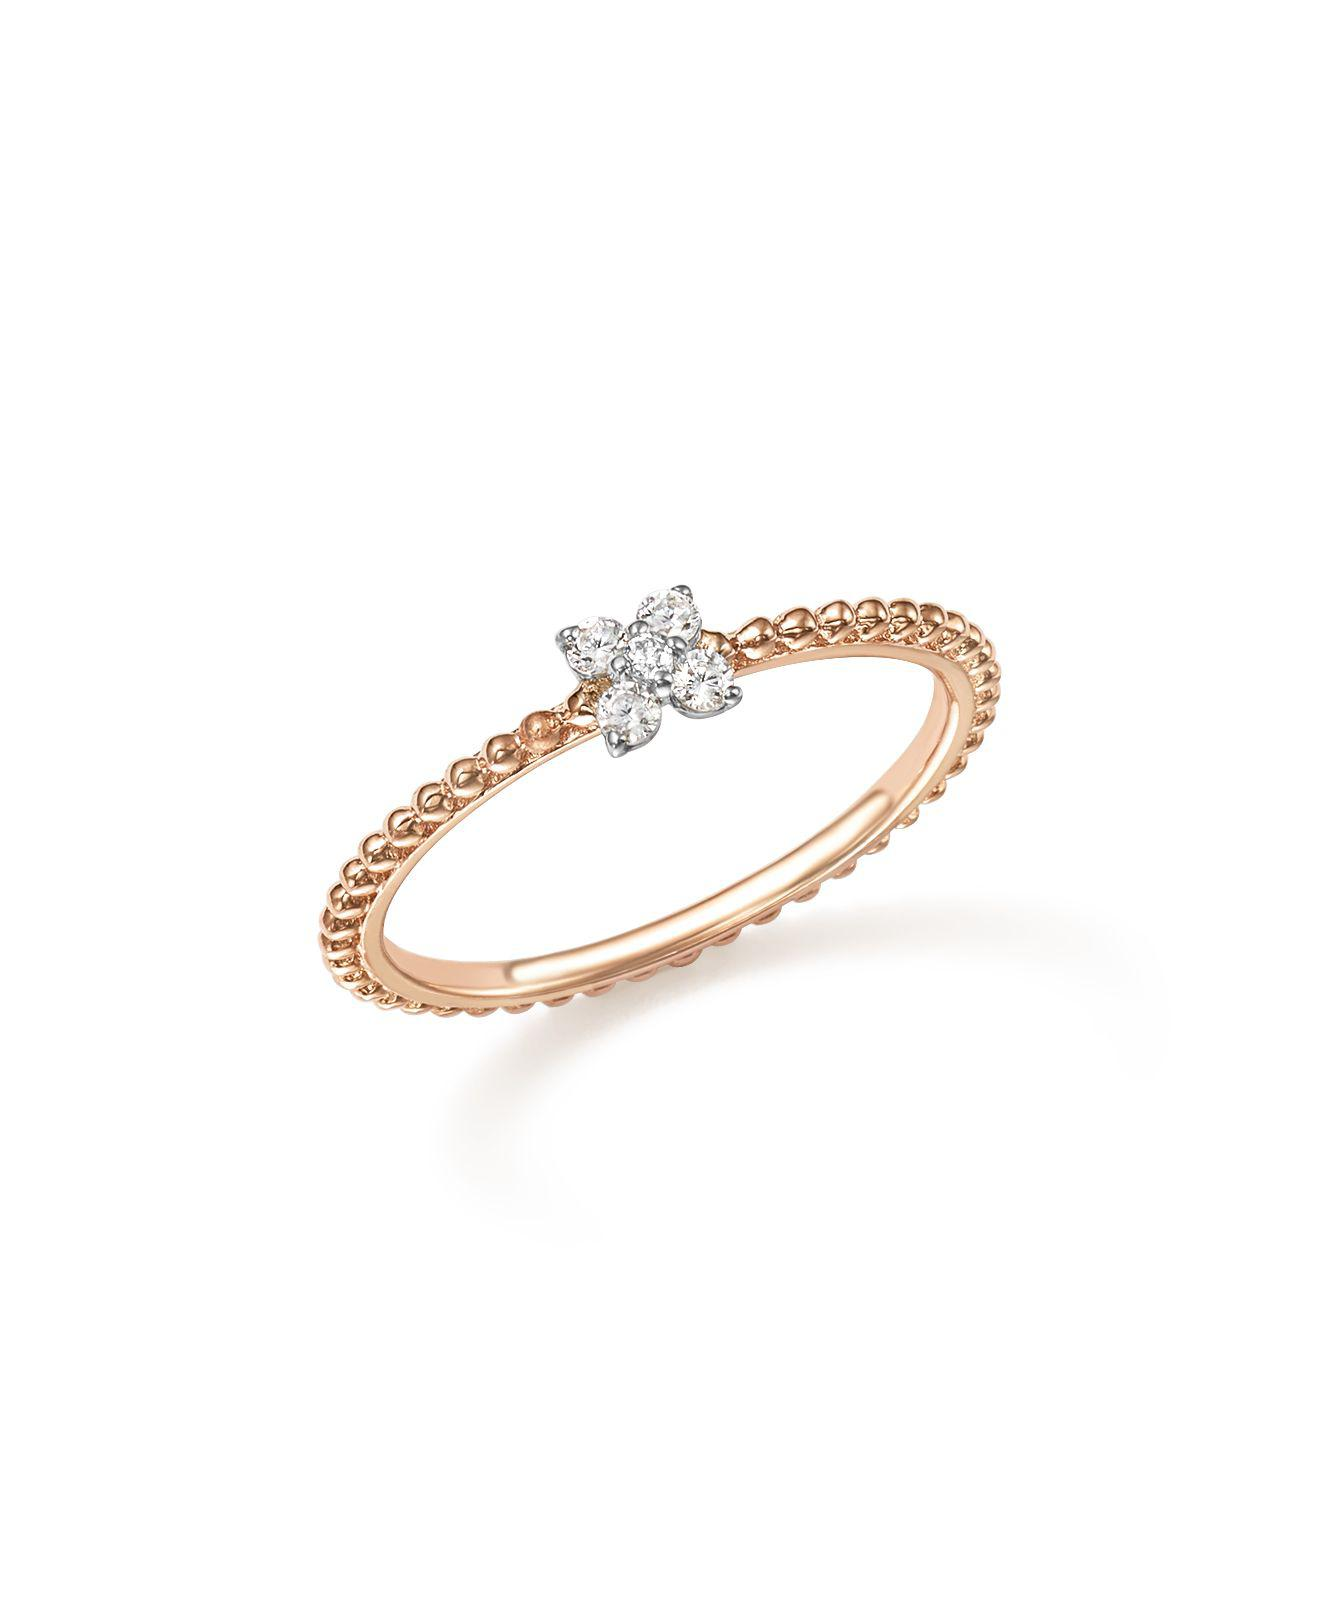 Lyst BloomingdaleS Diamond Cluster Beaded Ring In 14k Rose Gold